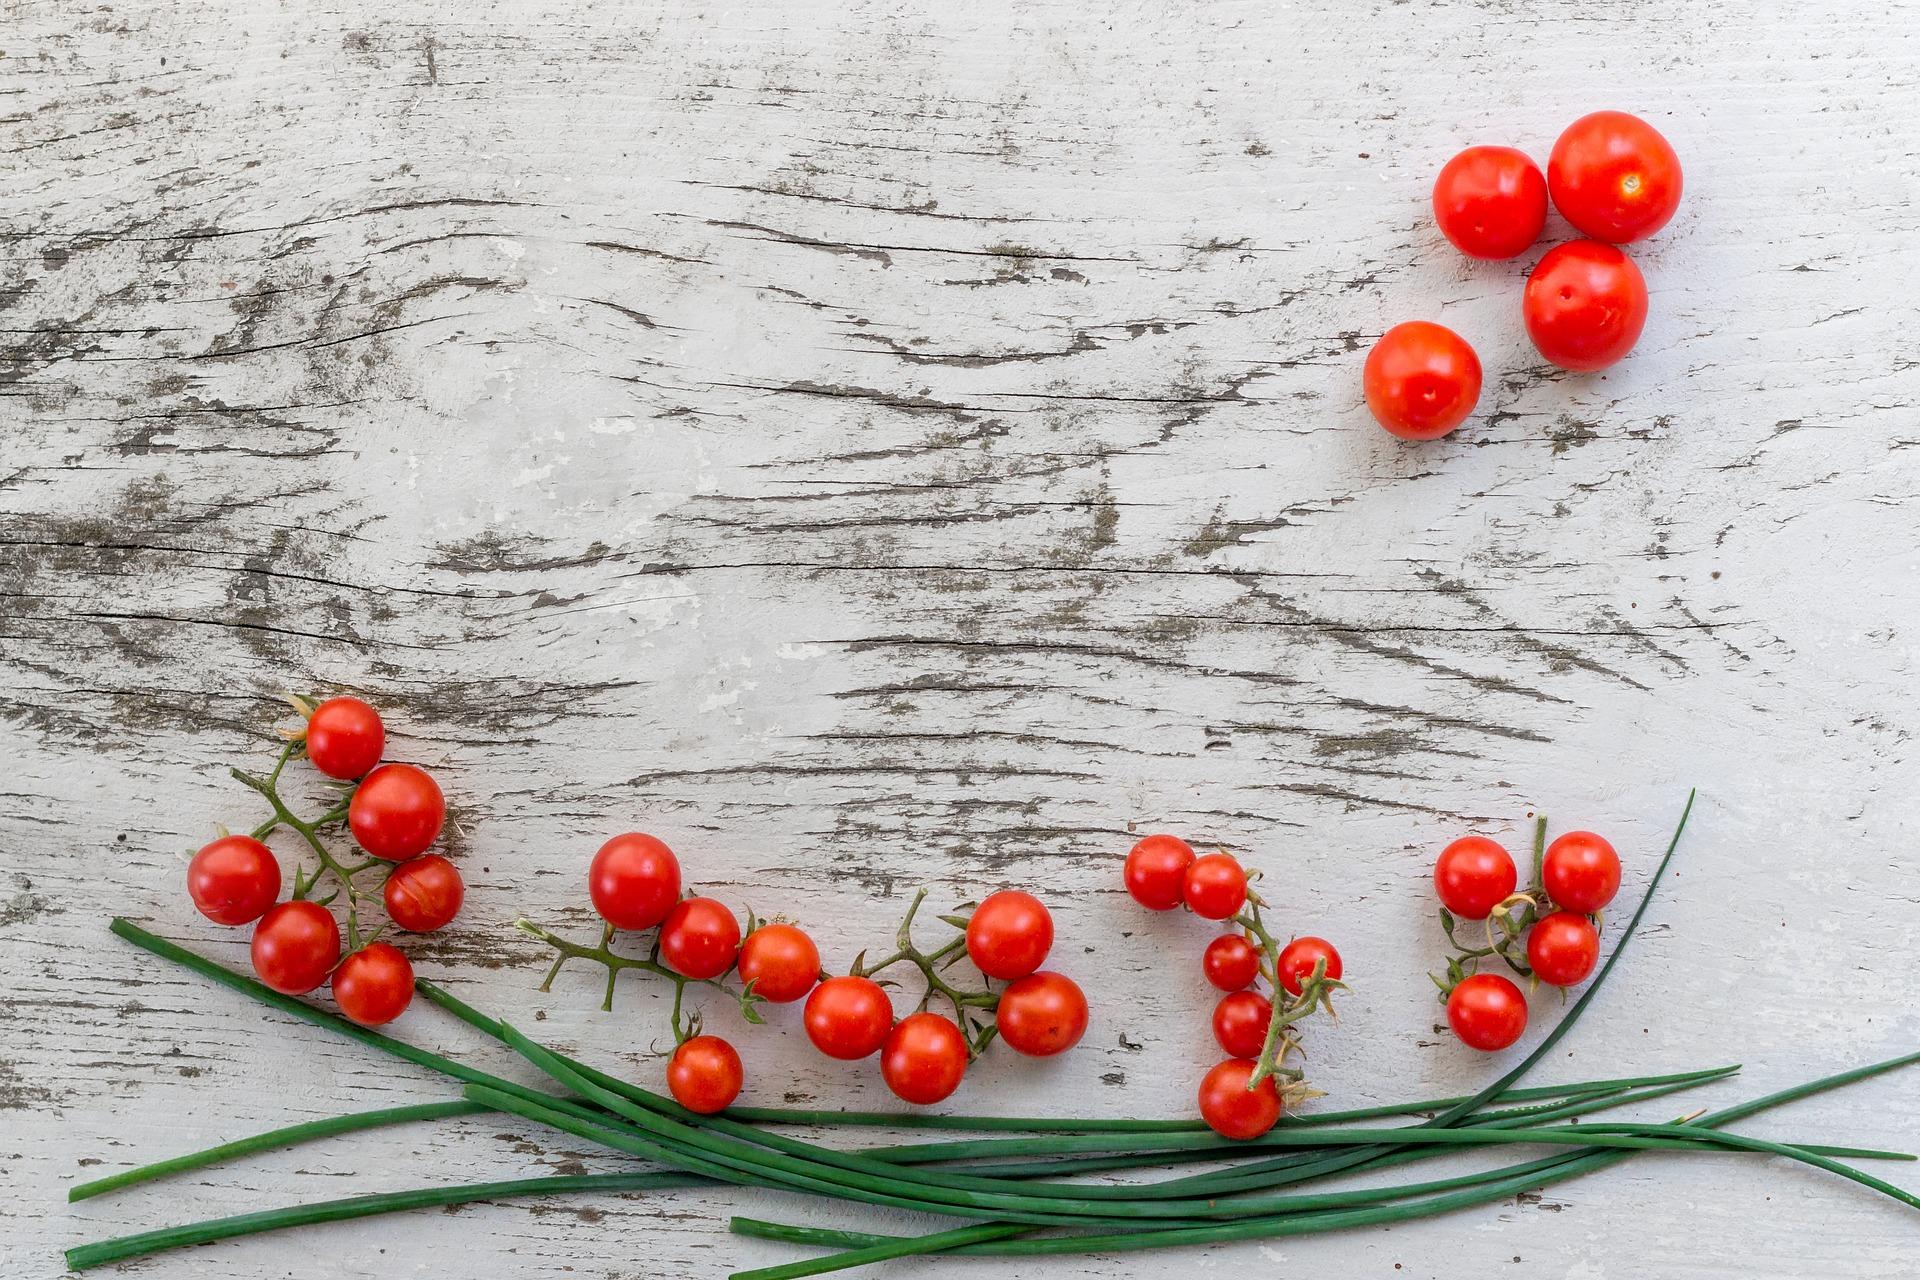 Raw Tomatoes Healthy Food